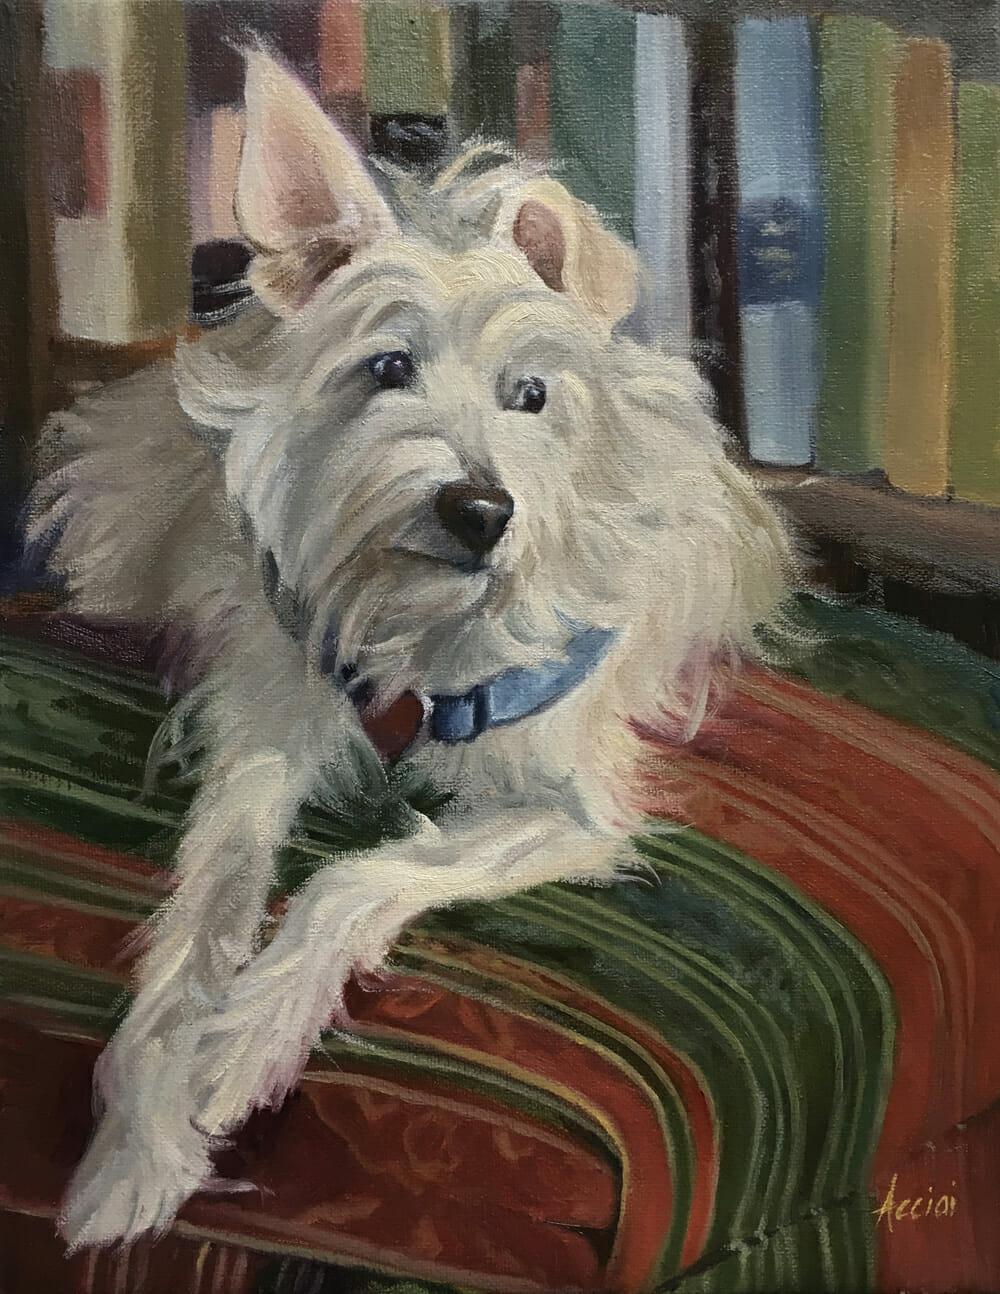 Amy-oil painting Lisa Acciai